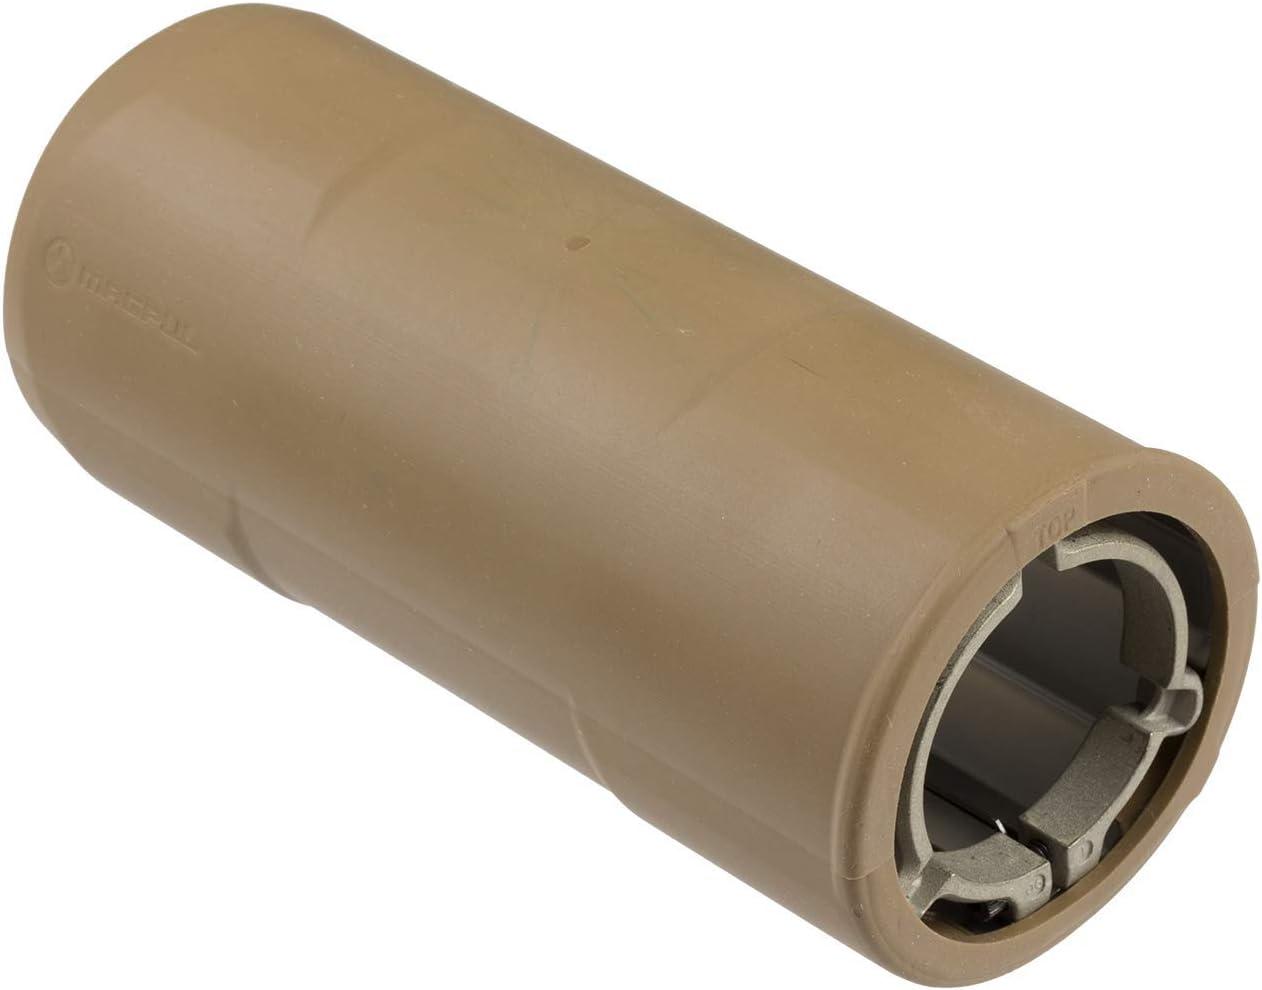 Magpul Suppressor Cover 5.5